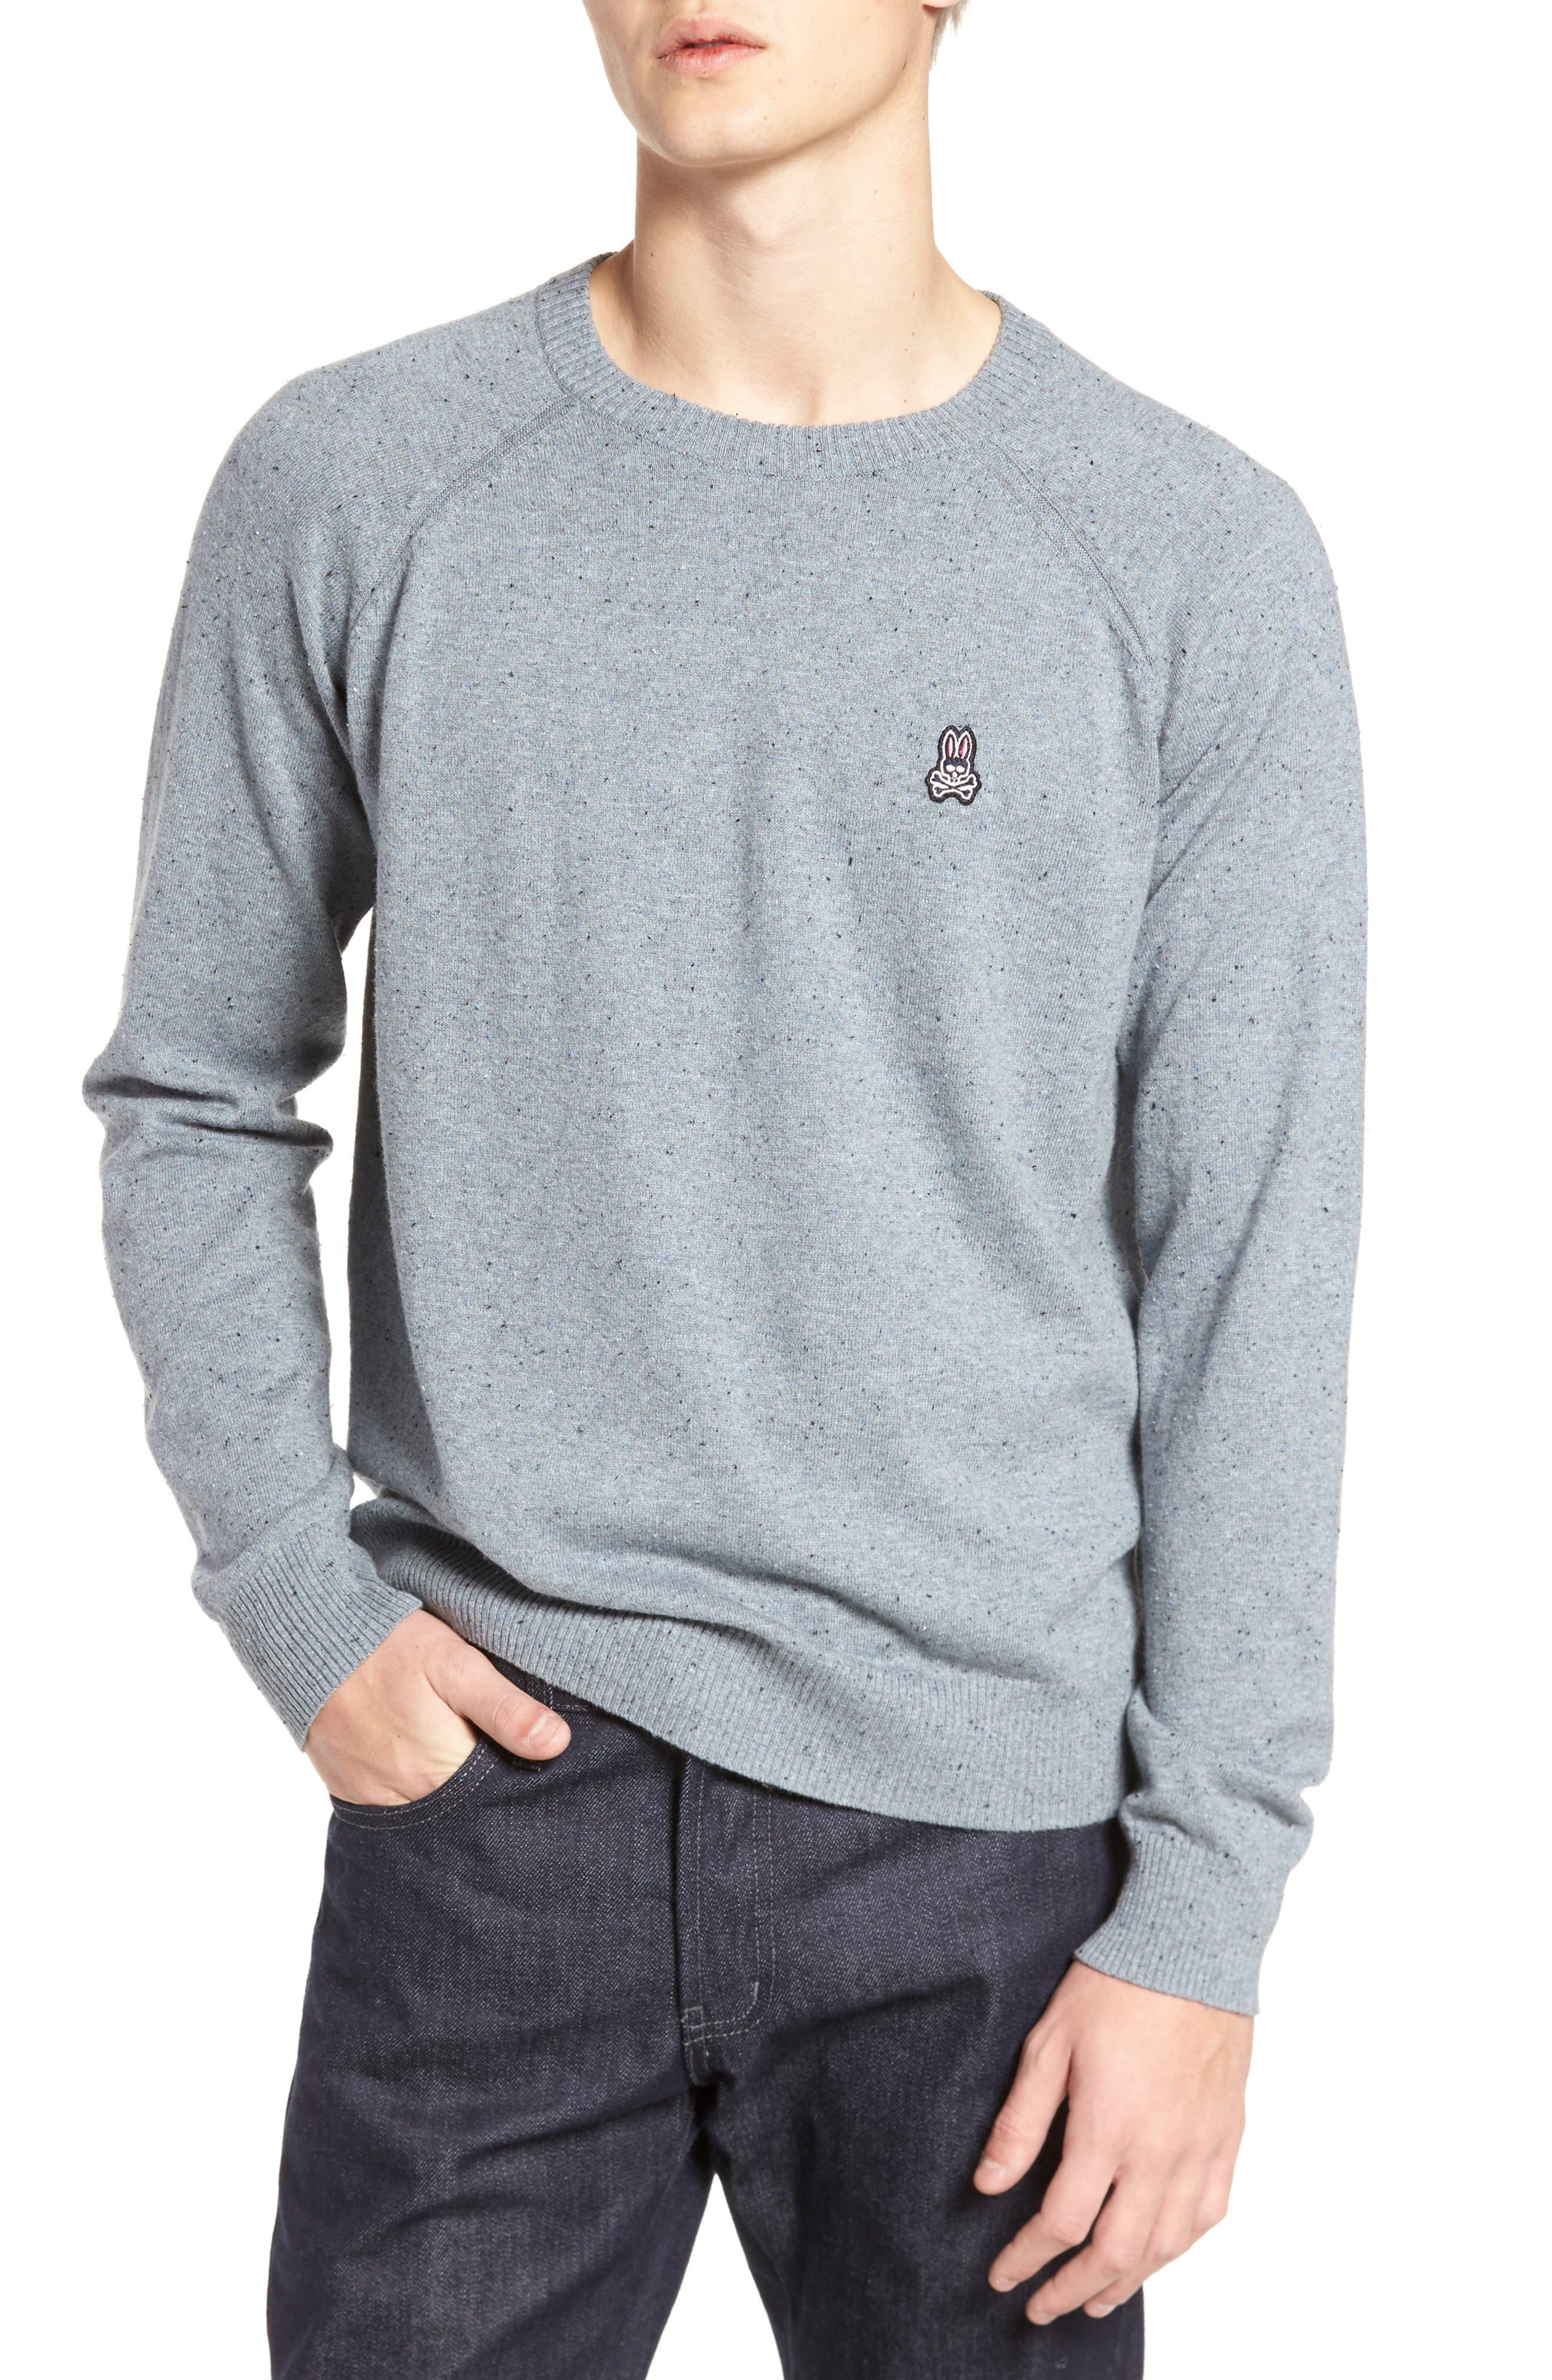 Psycho Bunny Crewneck Sweater